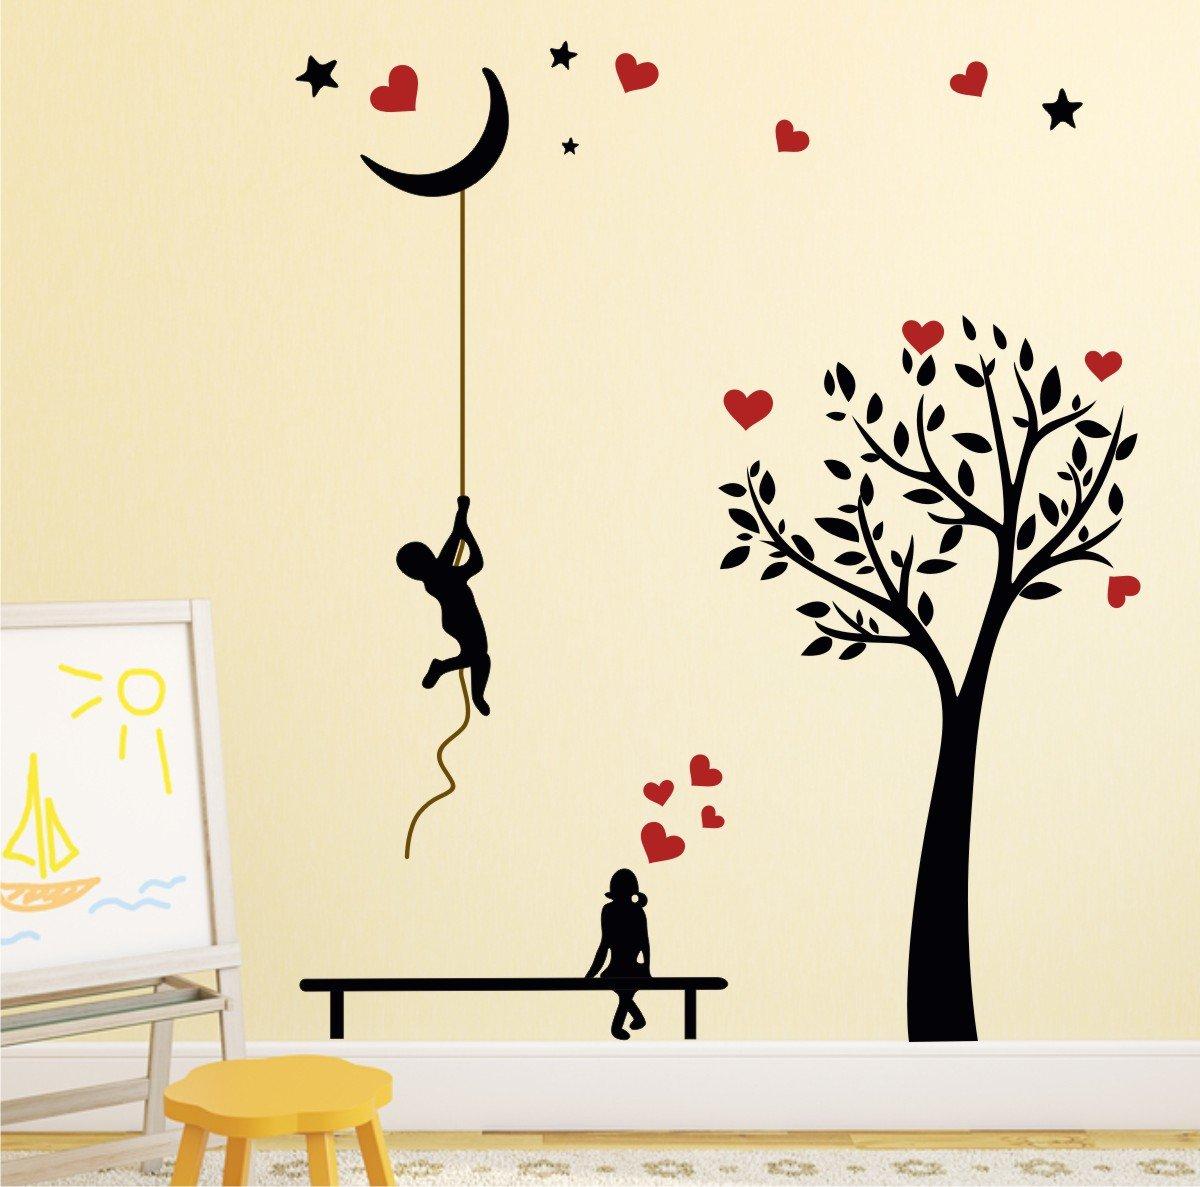 Buy Wallstick Black Tree Love Wall Sticker Vinyl 49 Cm X 4 Cm X 4 Cm Online At Low Prices In India Amazon In